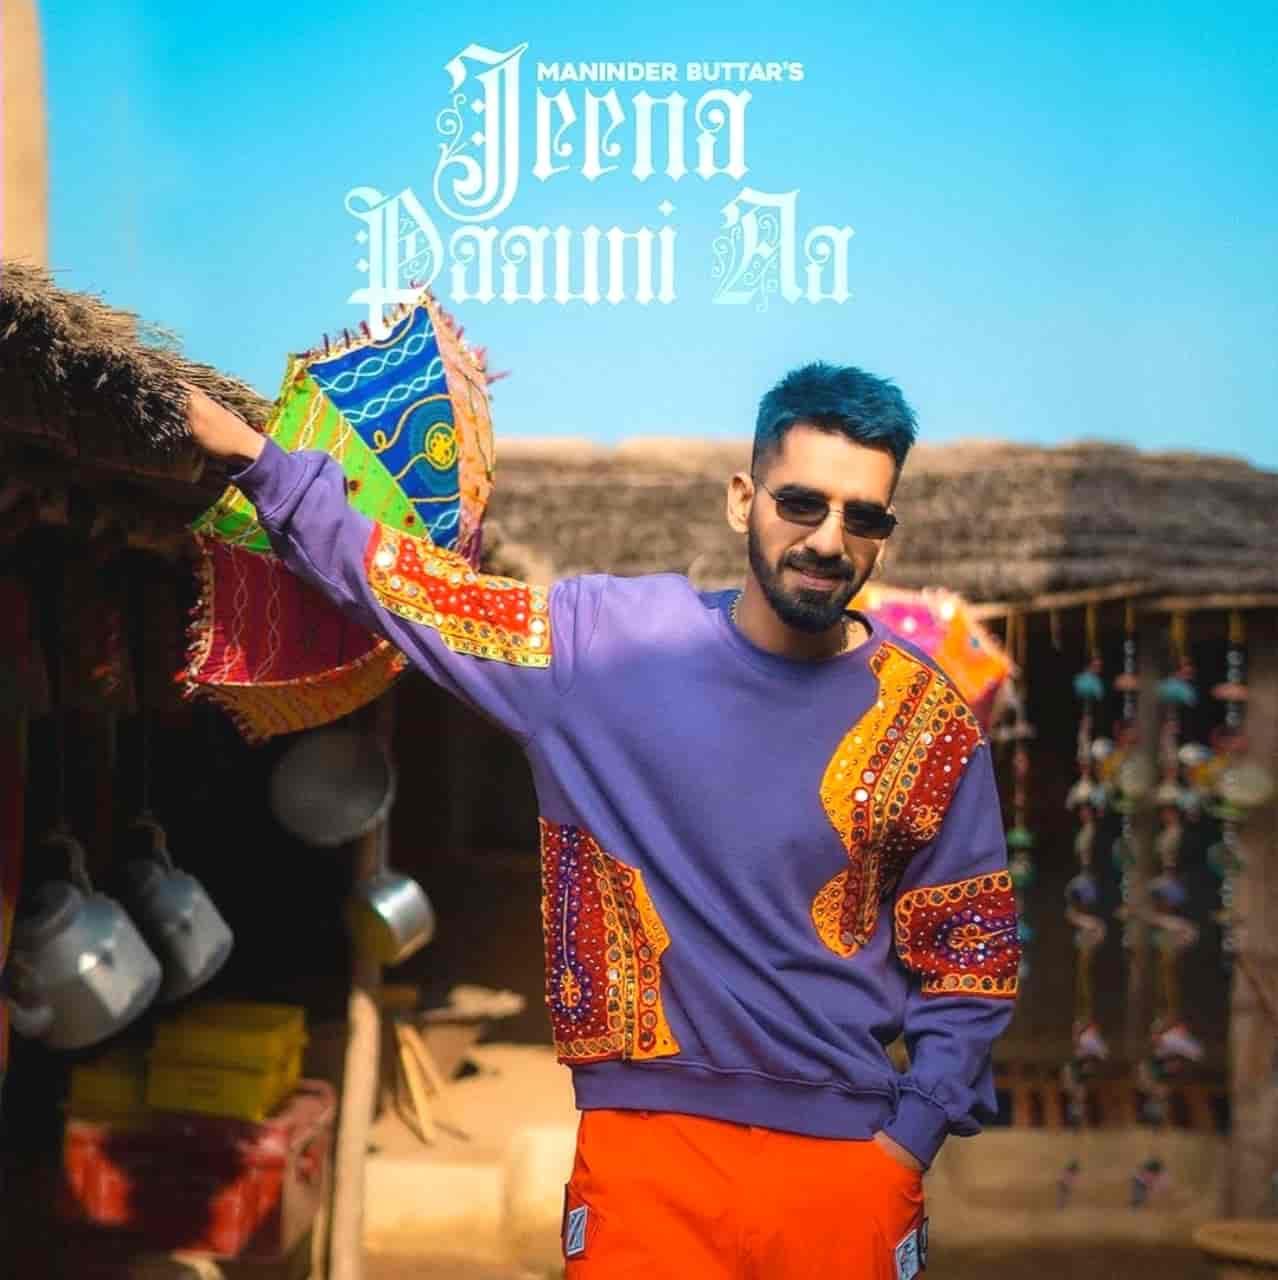 Jeena Paauni Aa Punjabi Song Lyrics Maninder Buttar